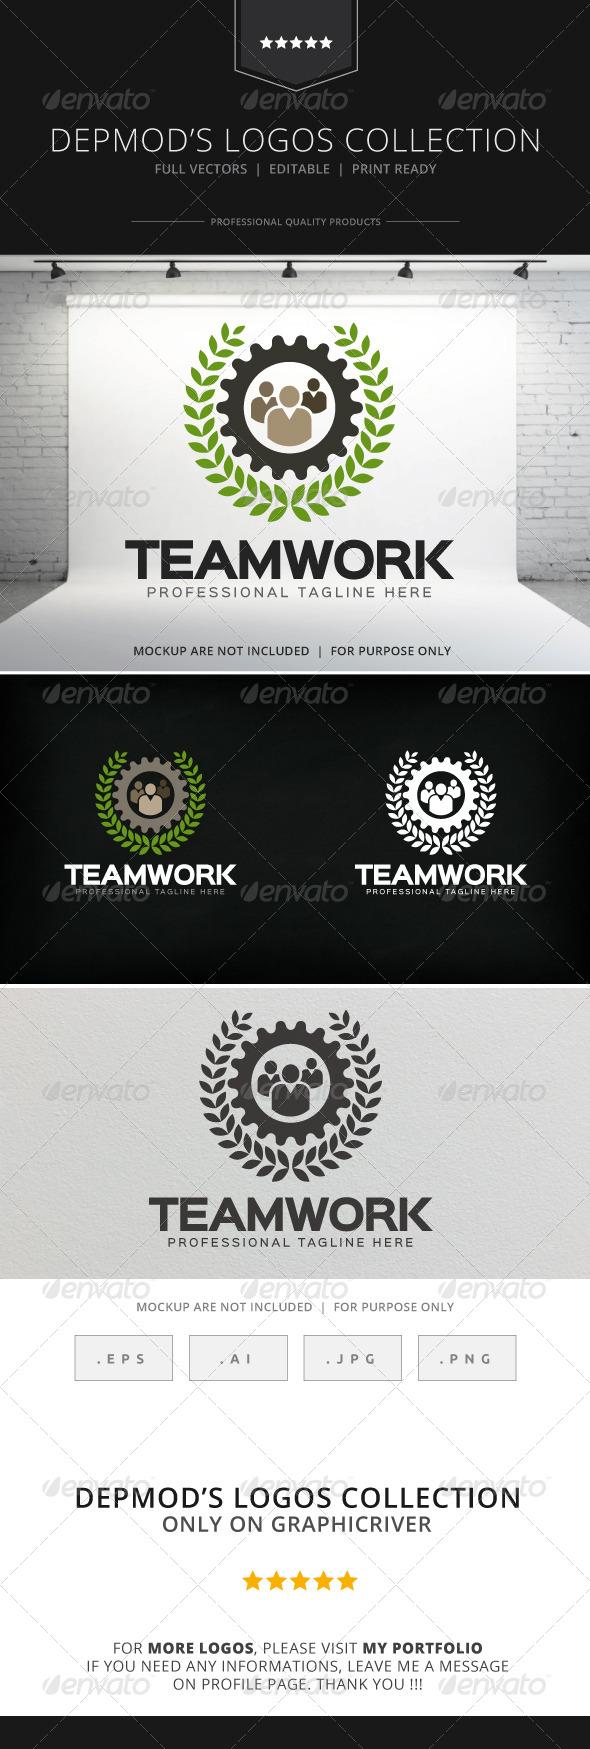 GraphicRiver Teamwork Logo 8315165